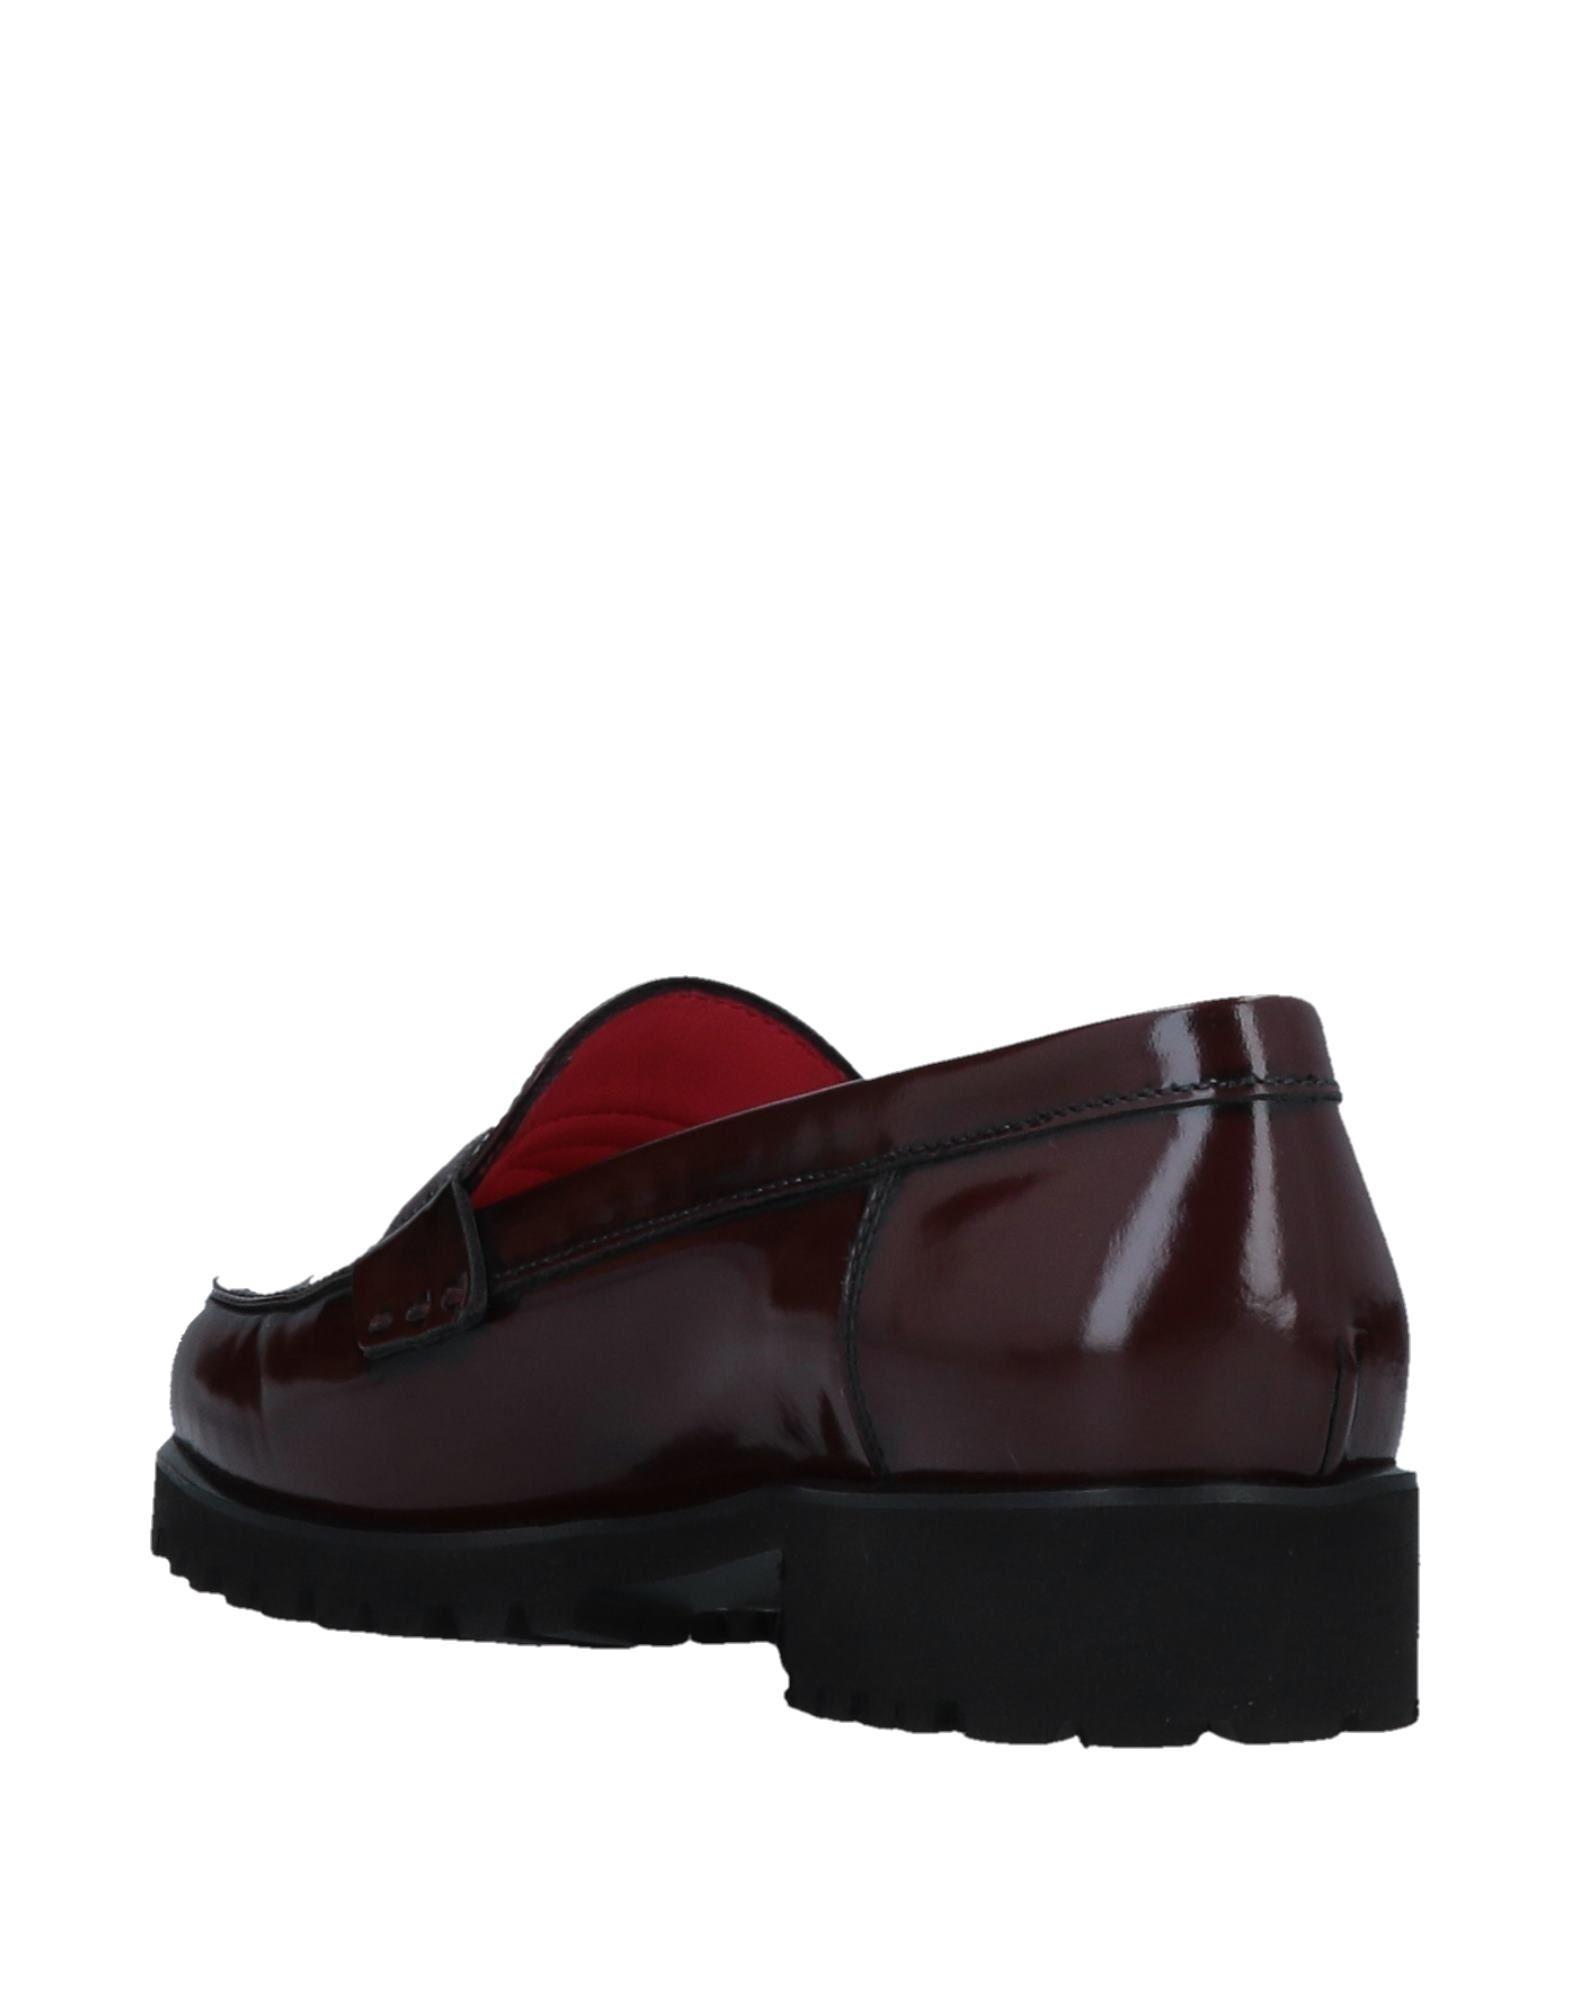 Stilvolle Rouge billige Schuhe Pas De Rouge Stilvolle Mokassins Damen  11510746LG f1540e